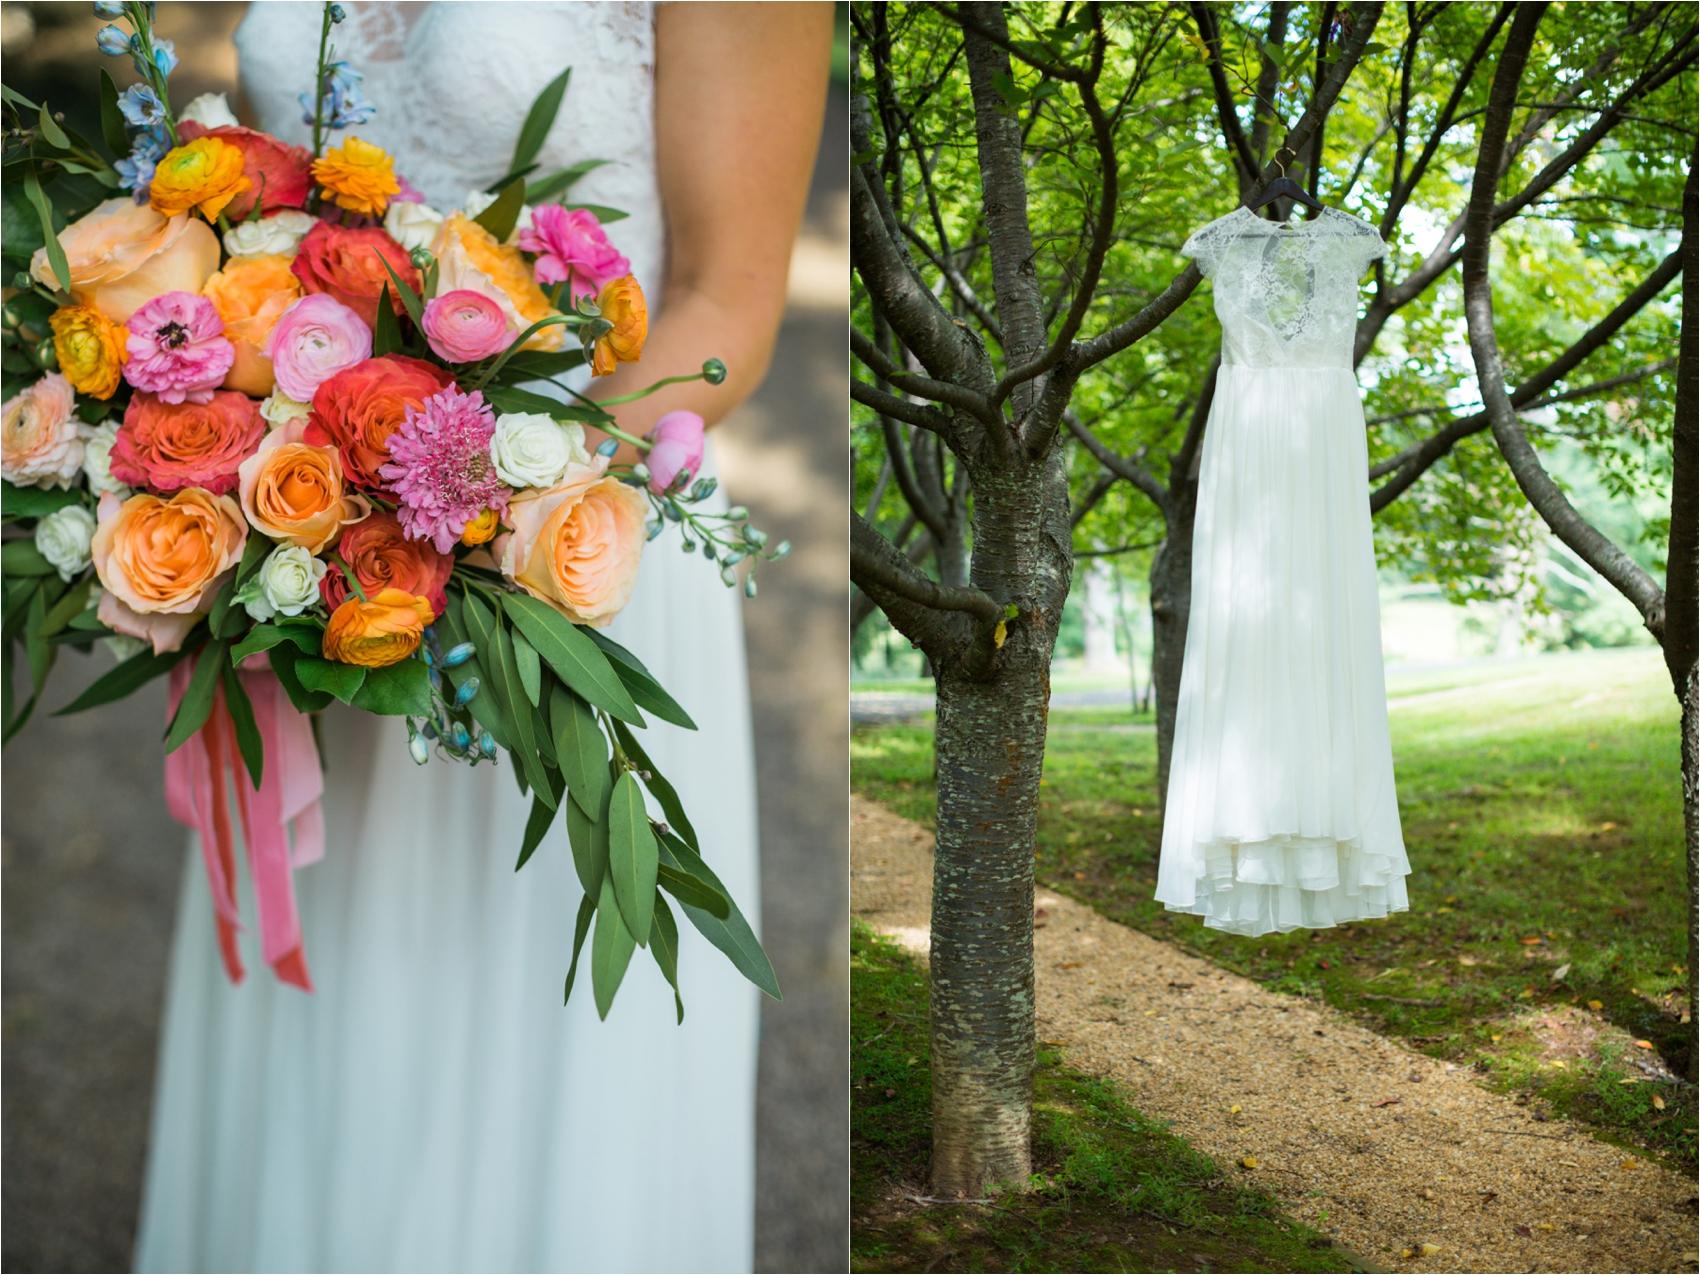 Feather-and-Oak-Rainforest-Trust-Virginia-Wedding-0110.jpg